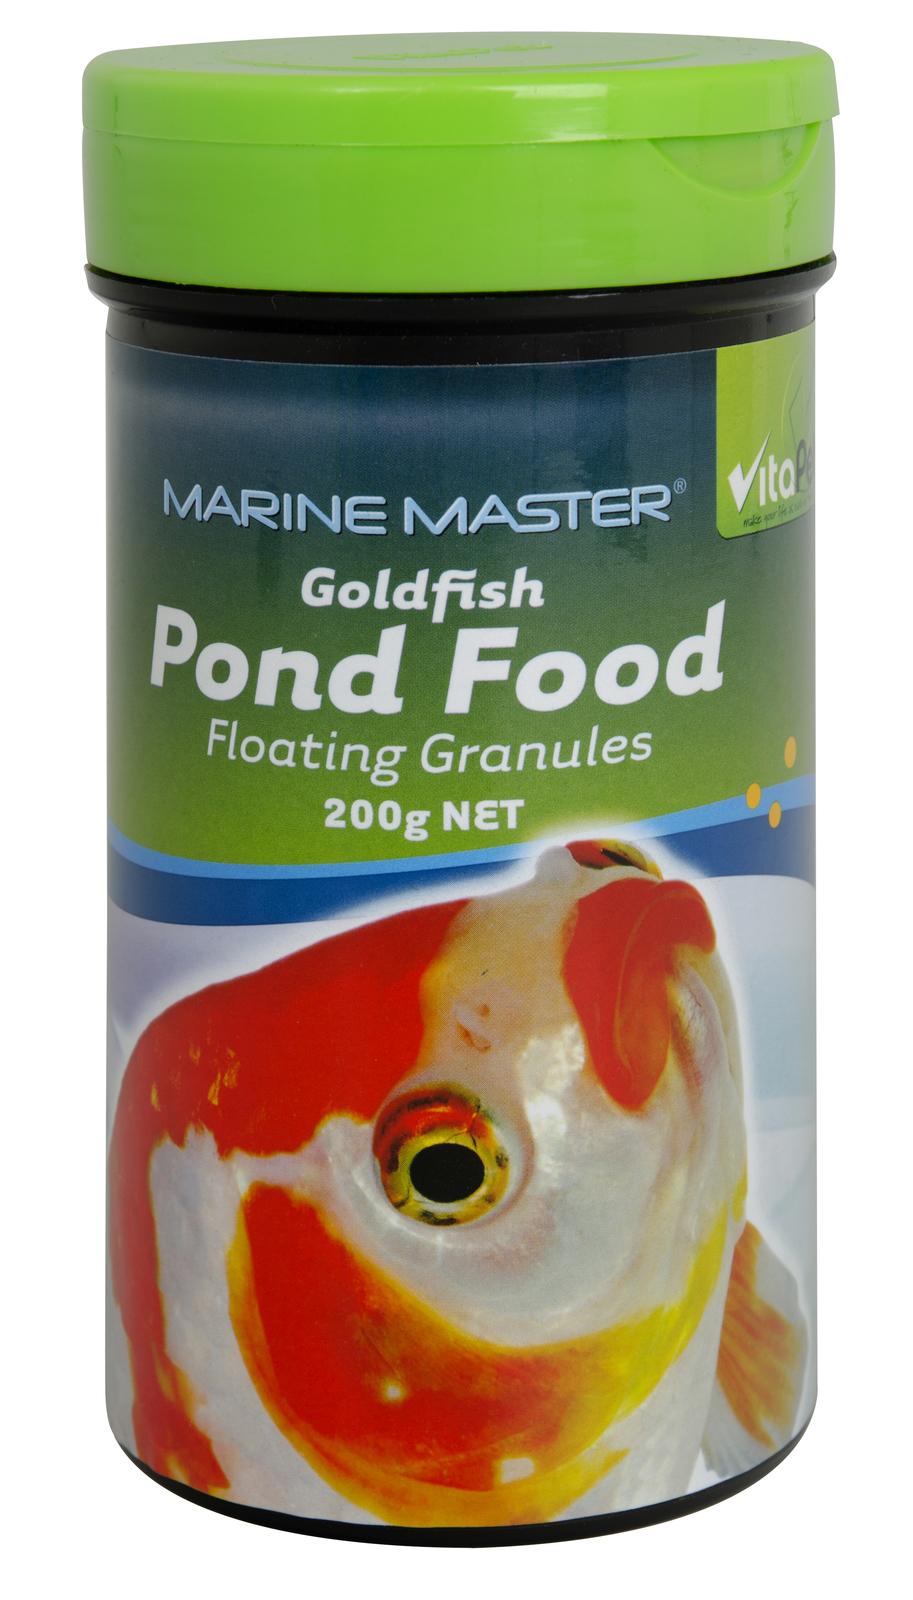 Vitapet: Goldfish Pond Food Granules 200g image